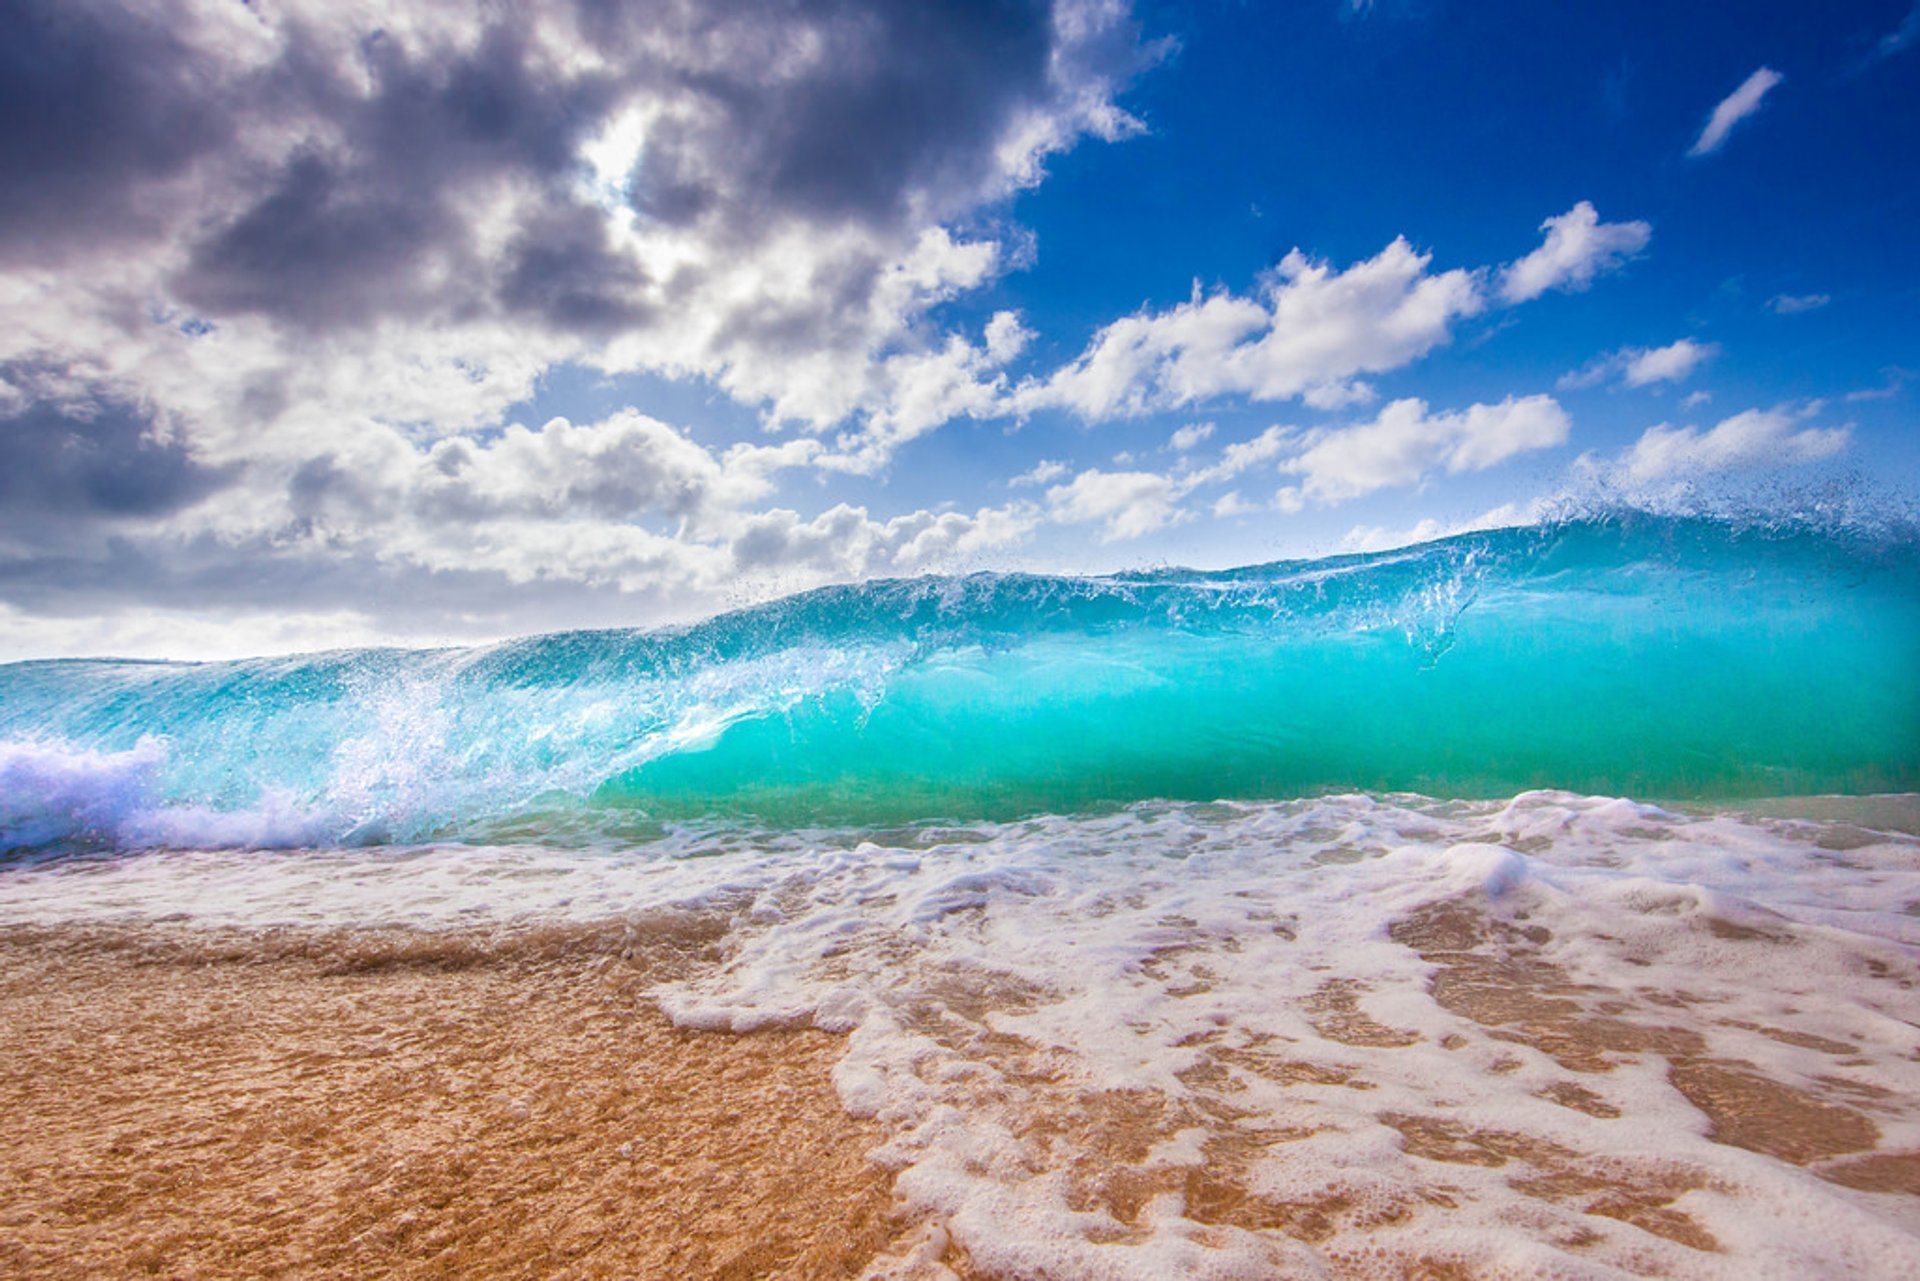 Beach Season in Hawaii - Best Season